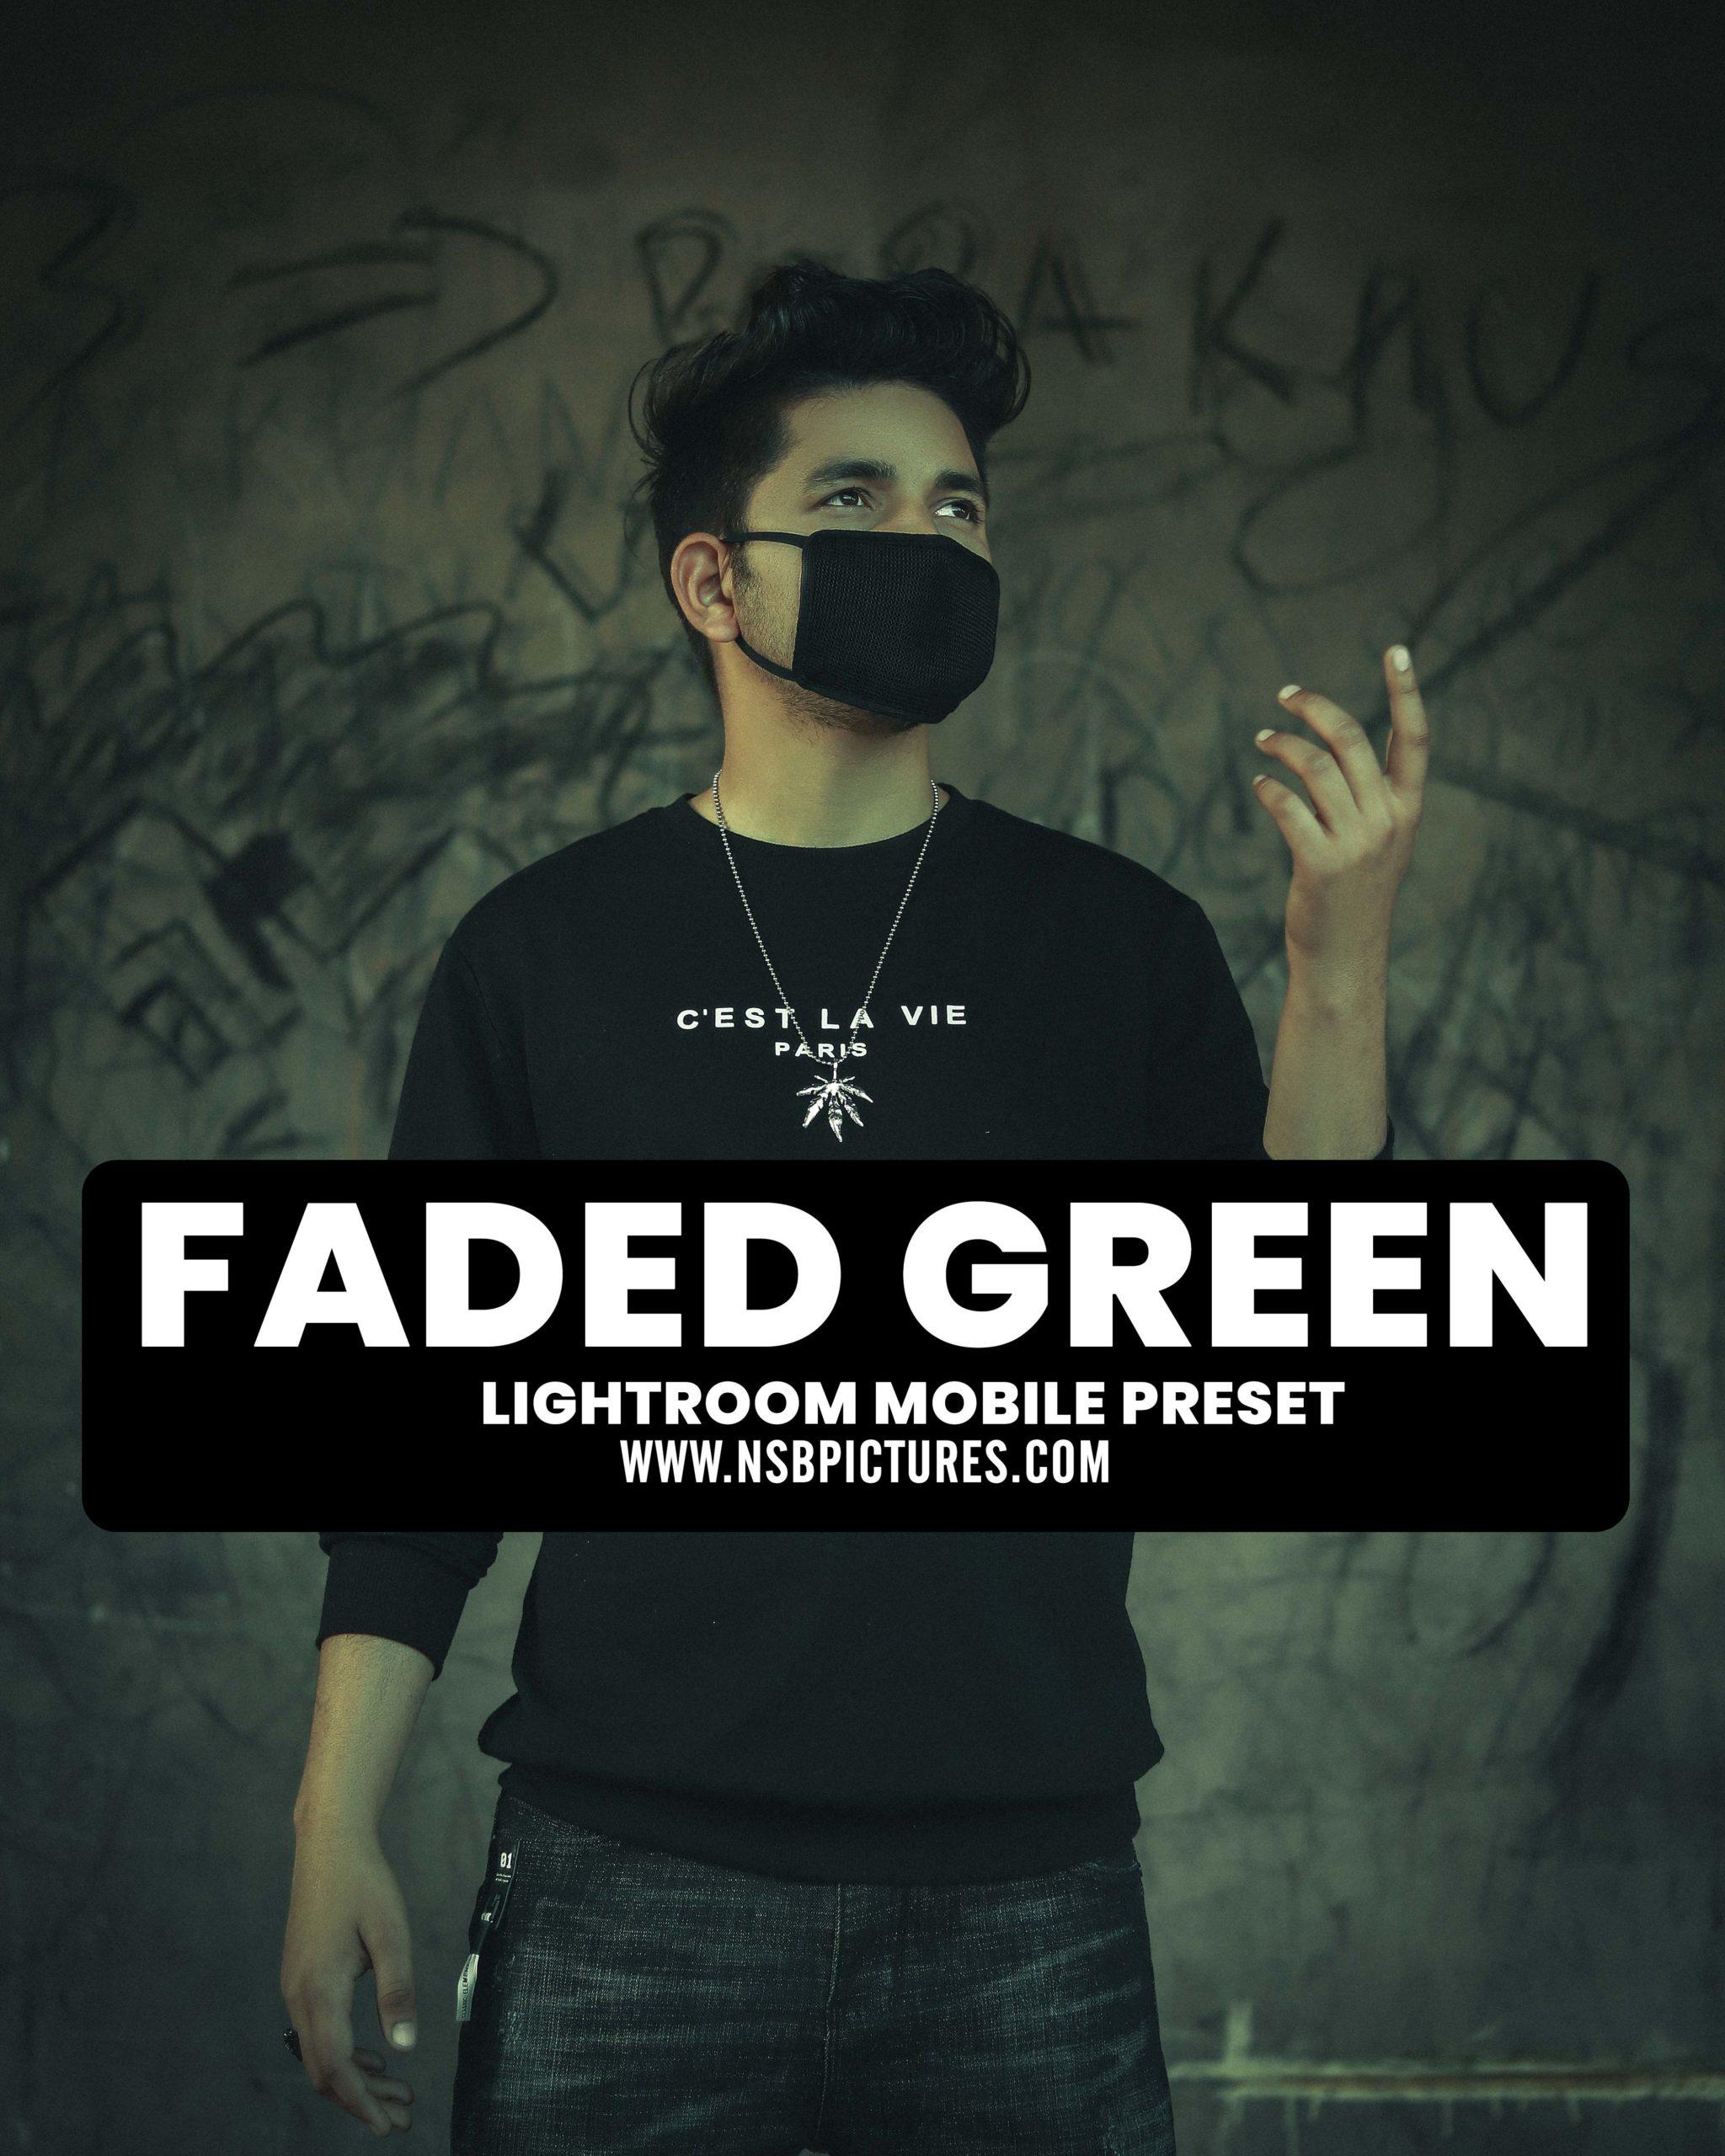 NSB FADED GREEN PRESET